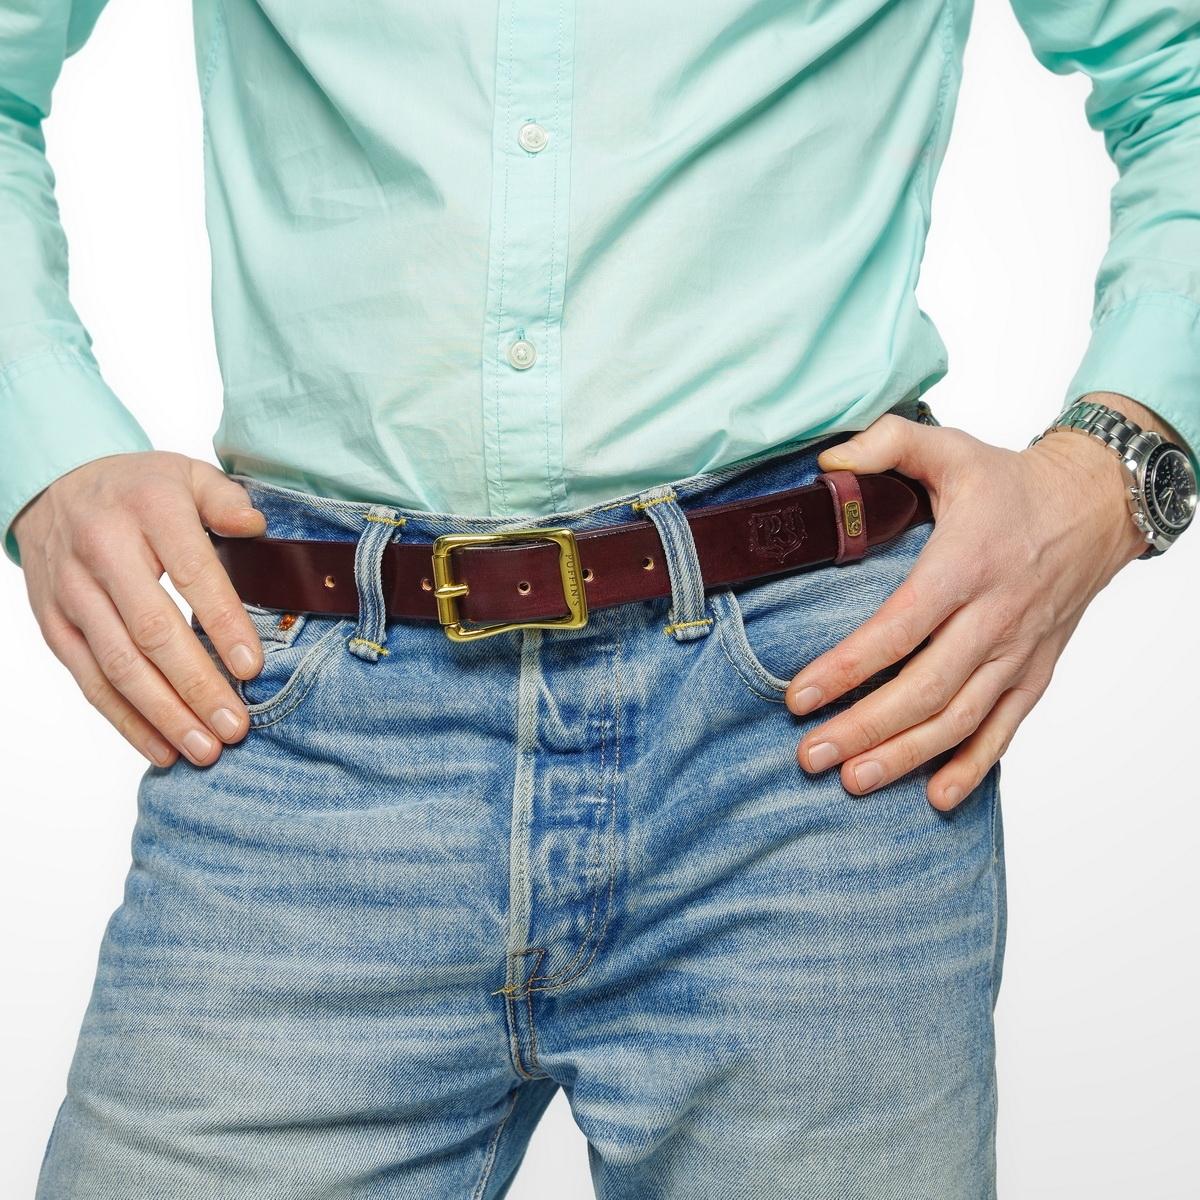 Exquisite belt with roller brass buckle 30mm bordeaux